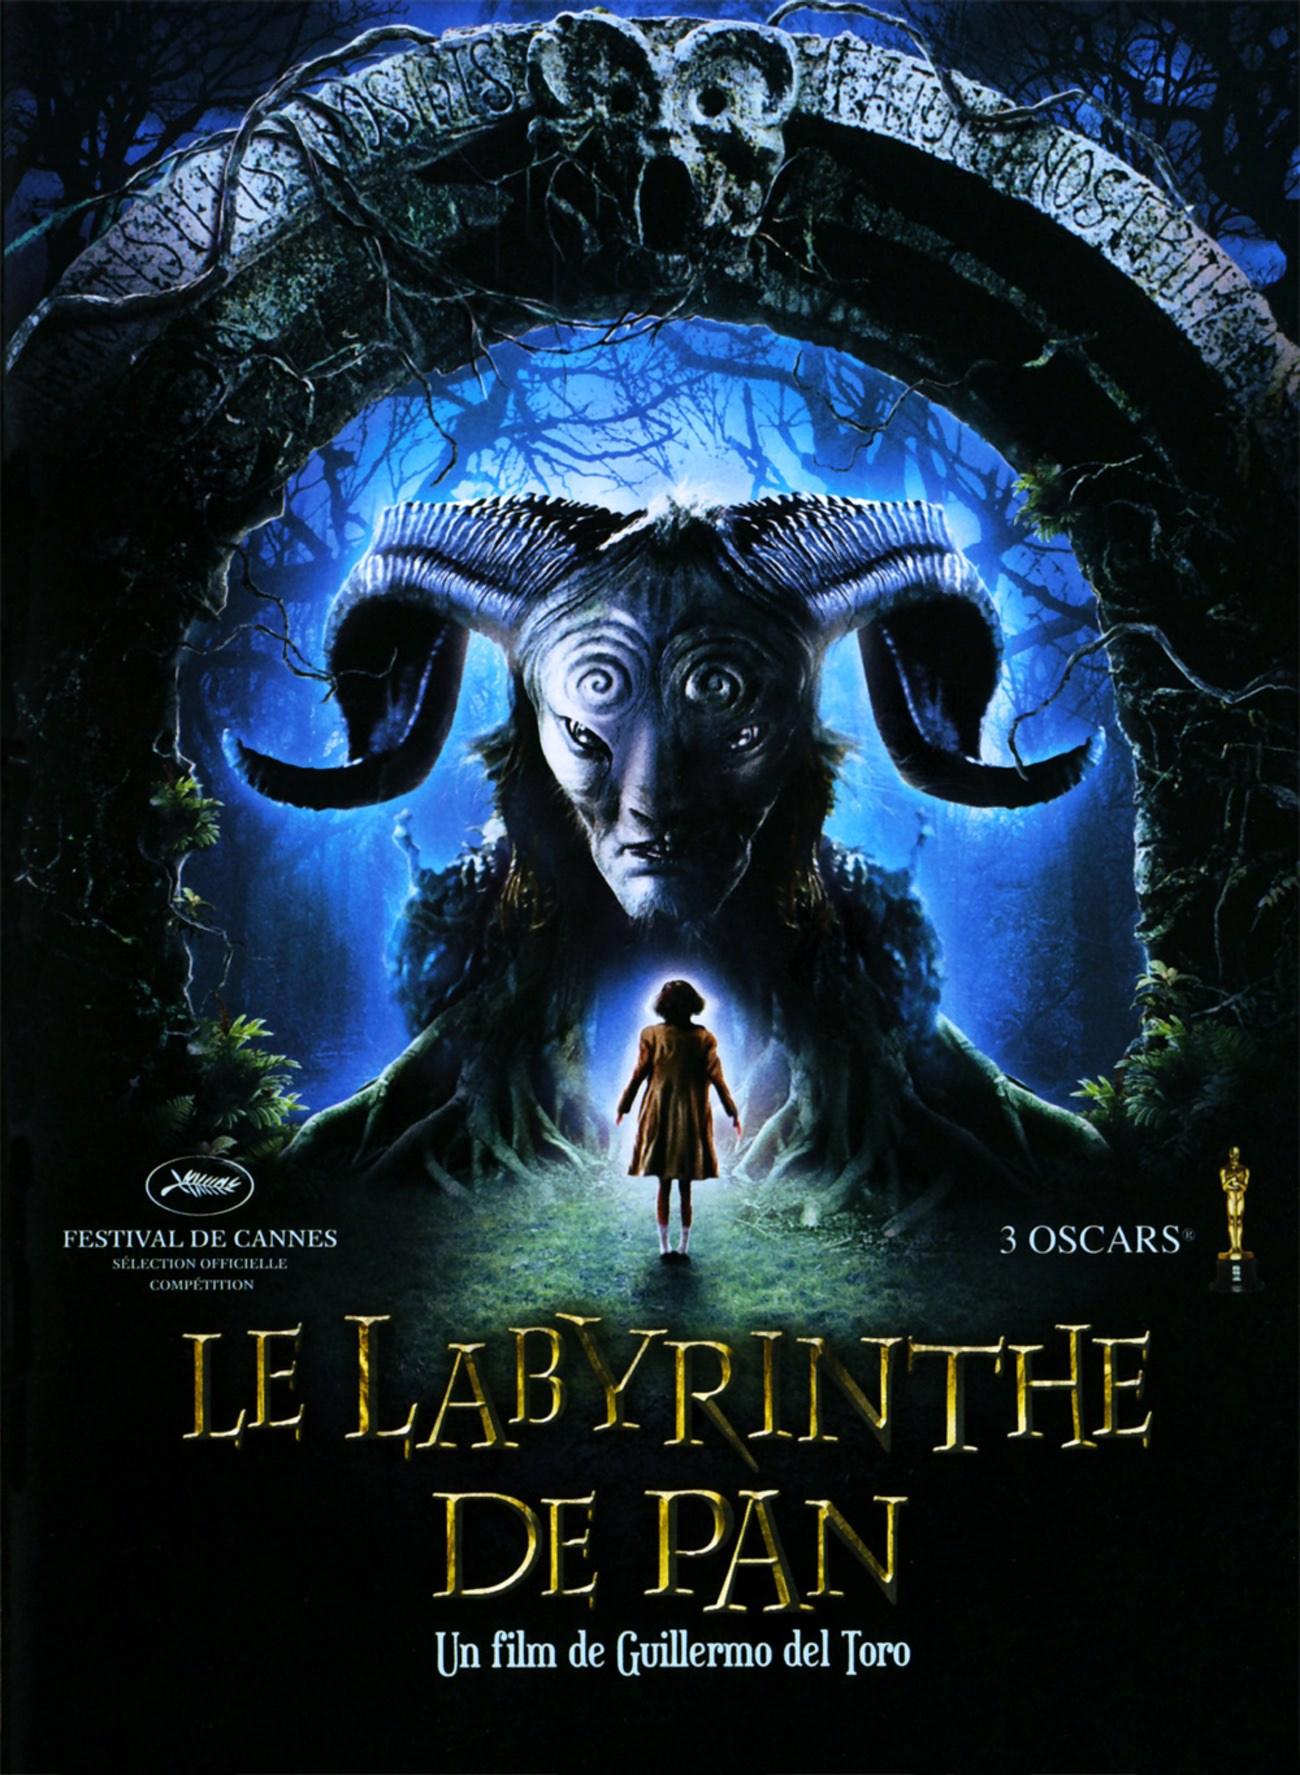 Labyrinthe pan toro